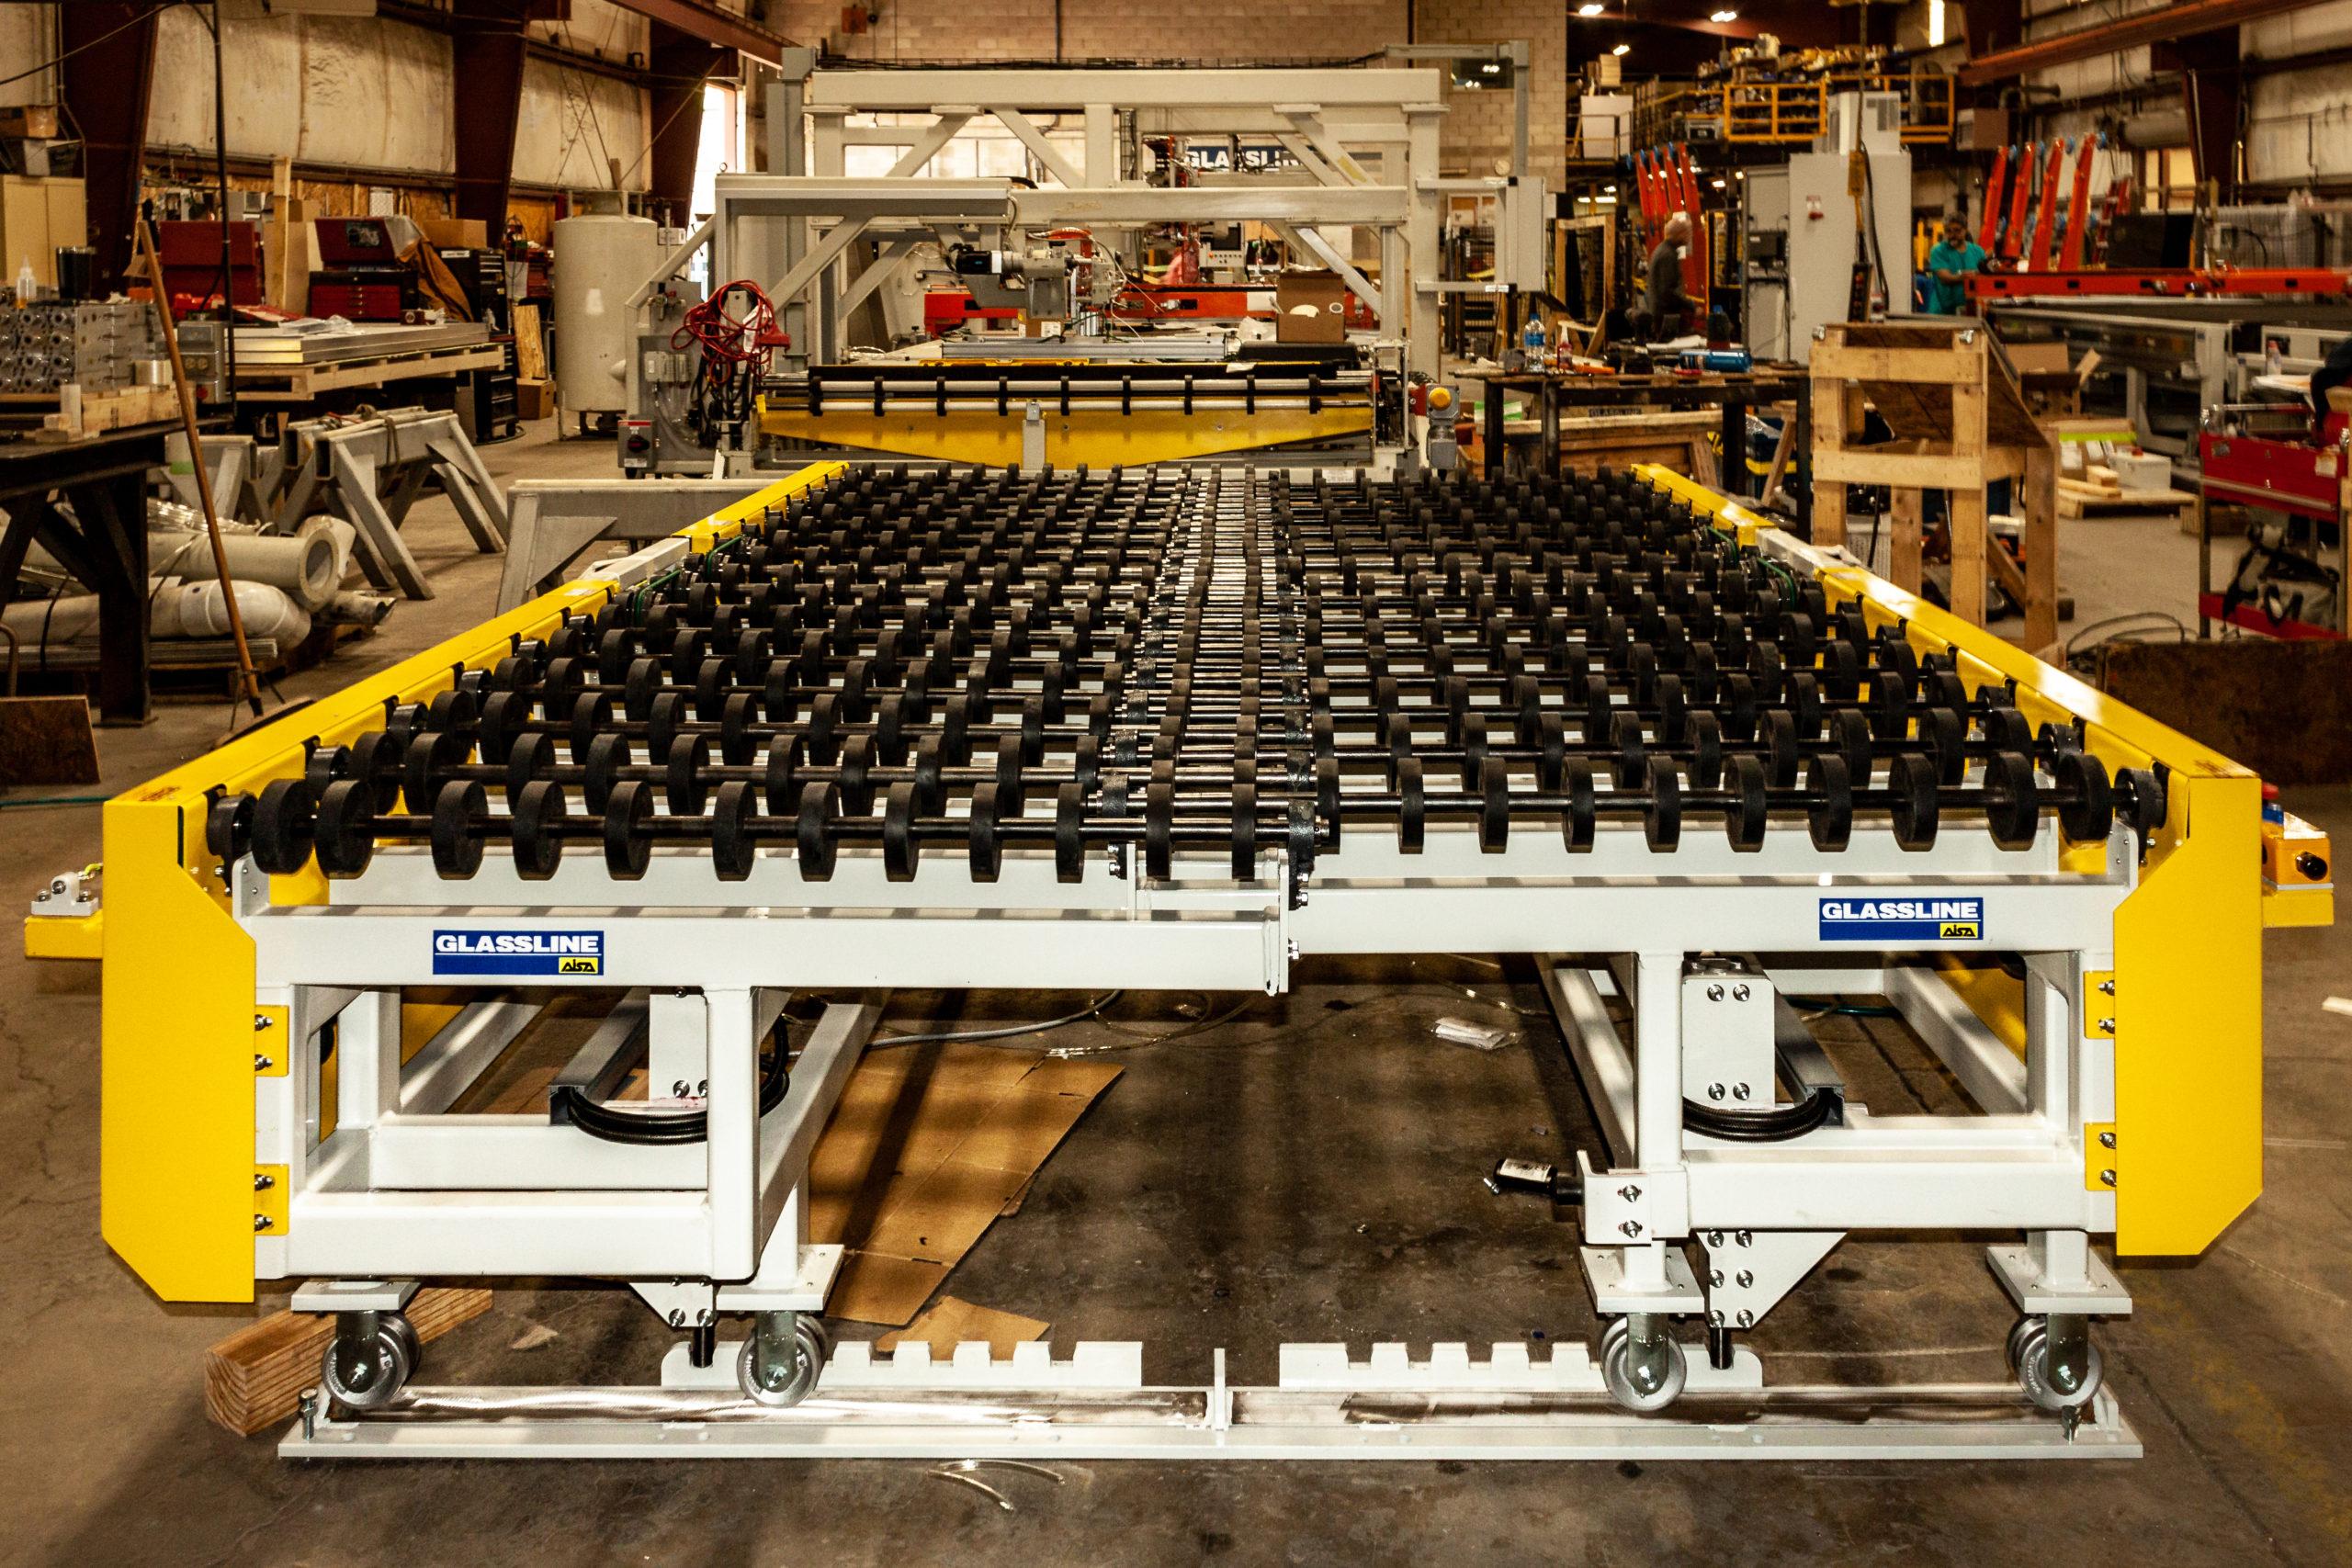 Roll Conveyors - Expand-retractable conveyor | Glassline